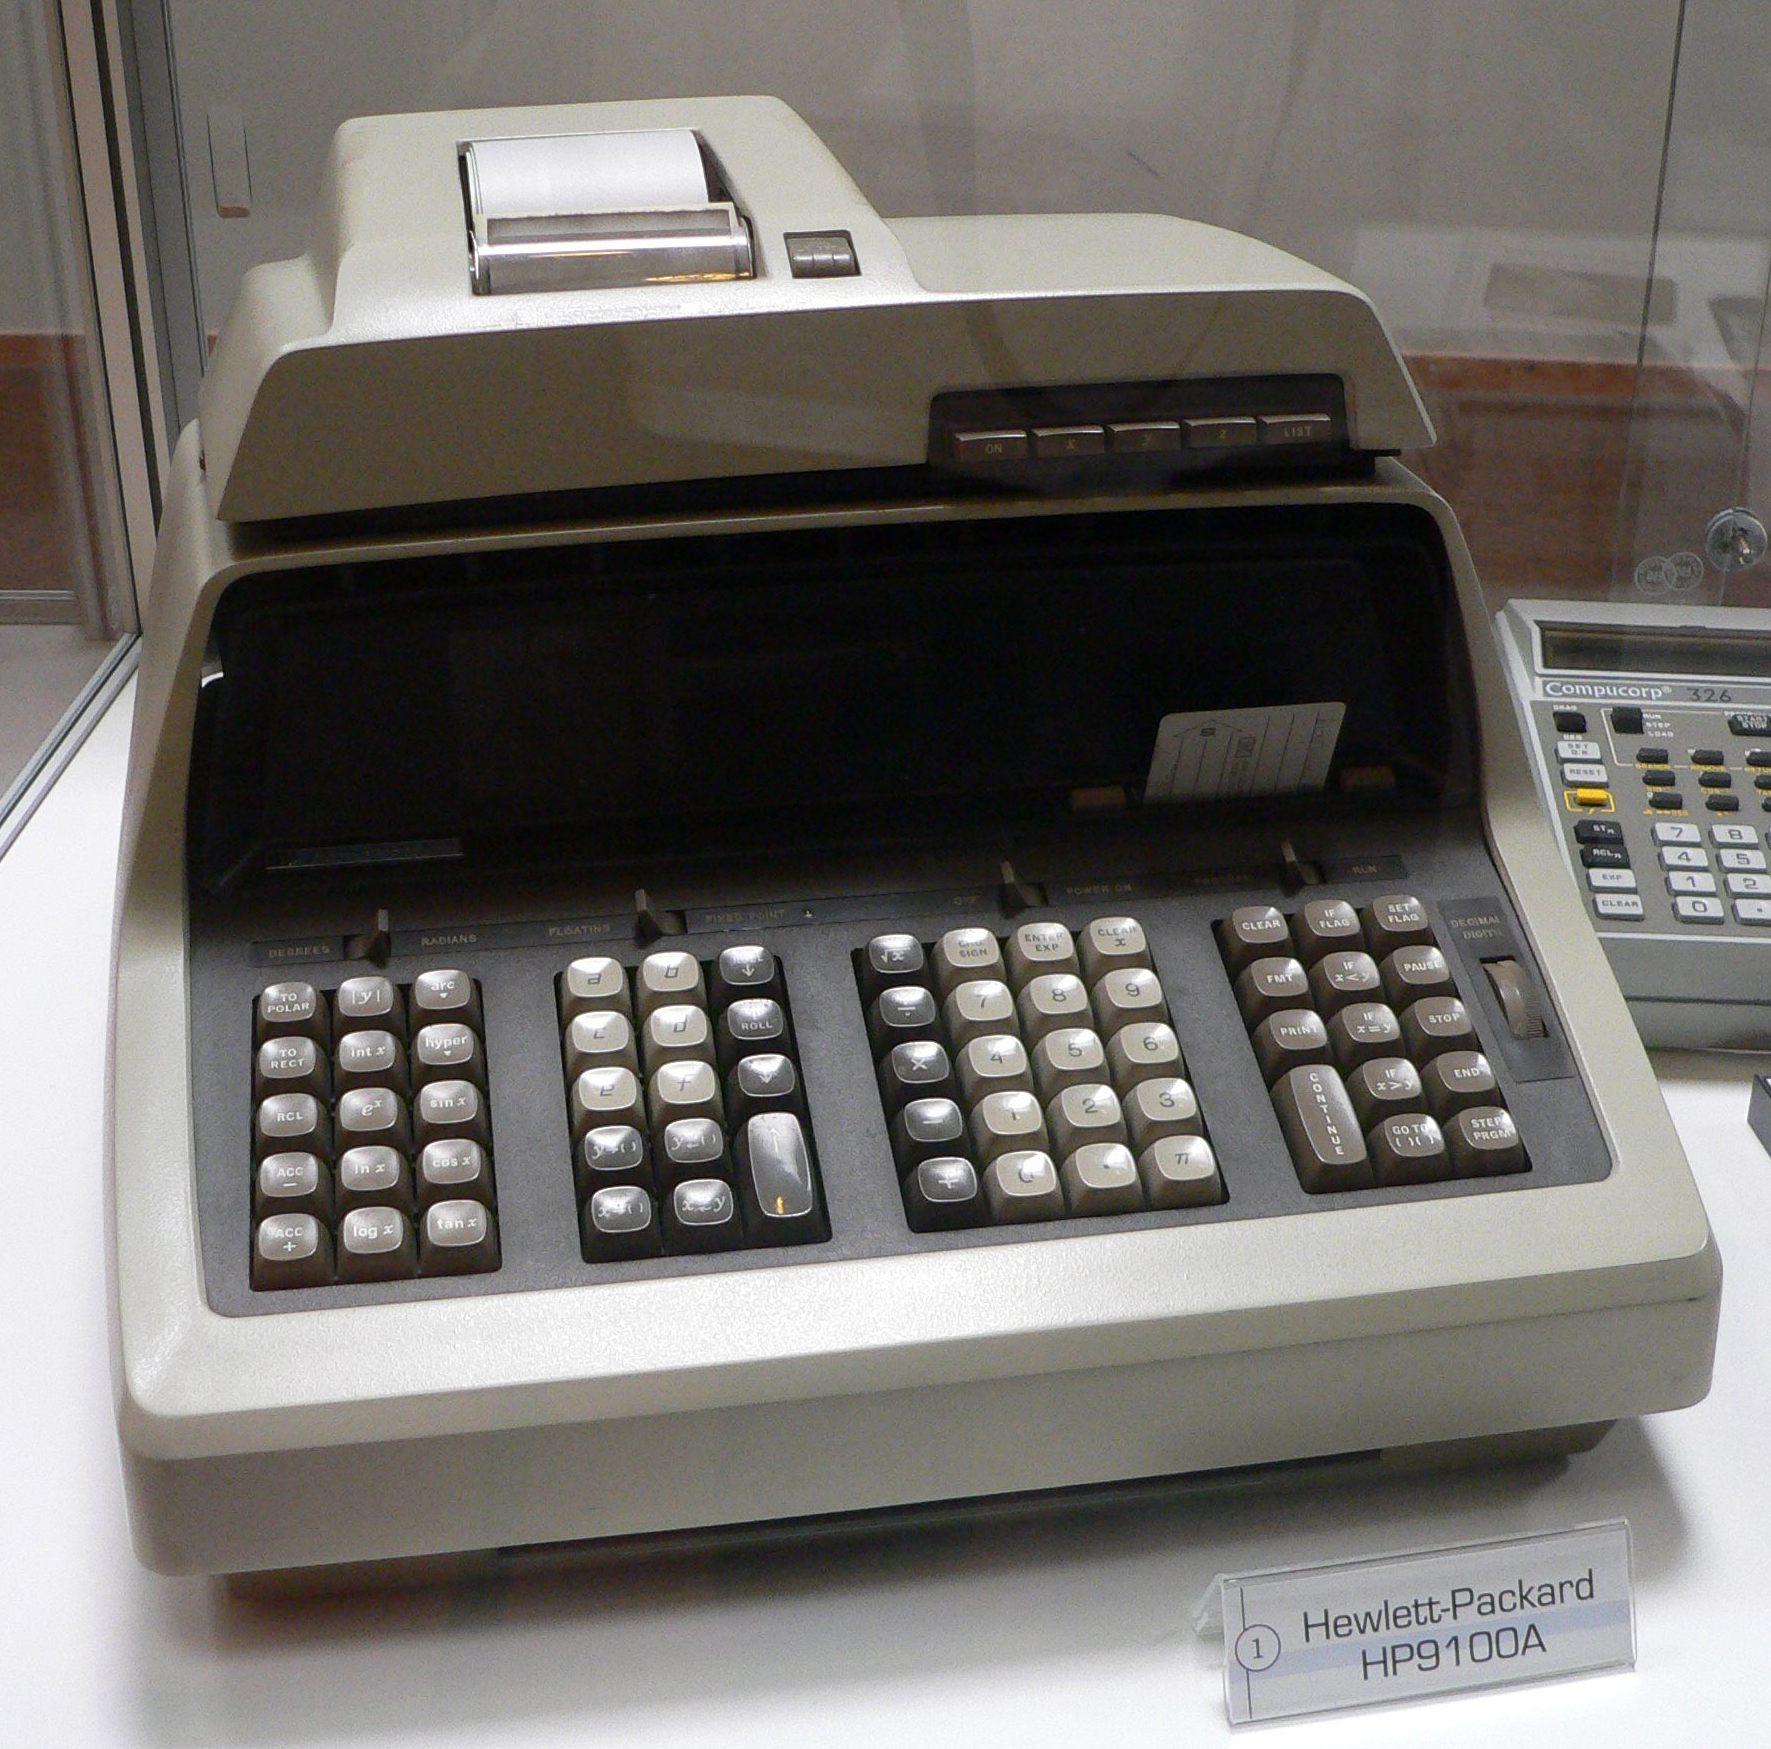 Hewlett-Packard | Wiki | Everipedia